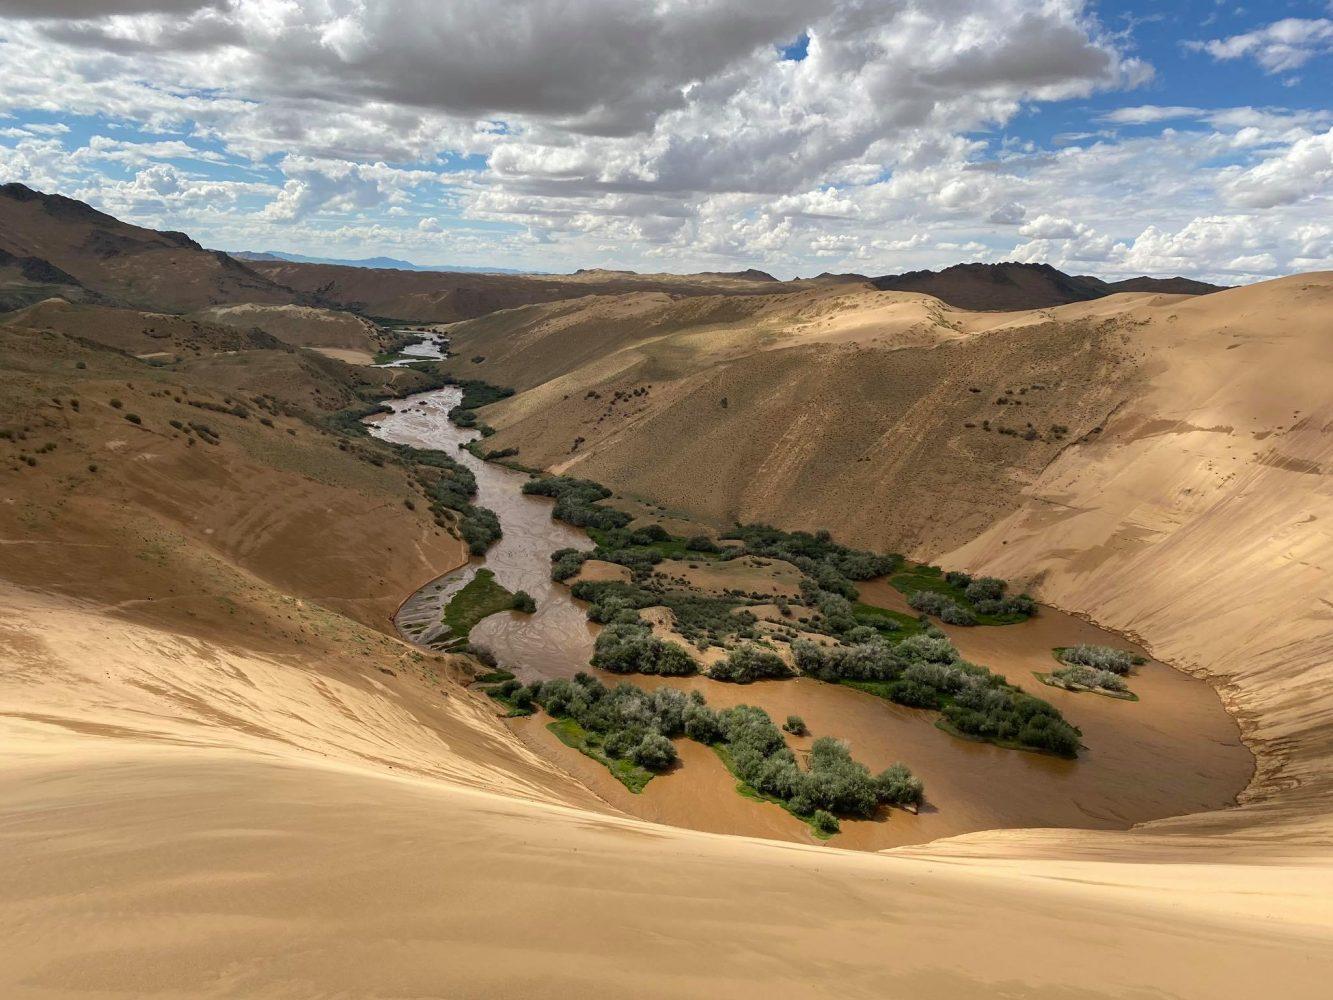 Mukhart River